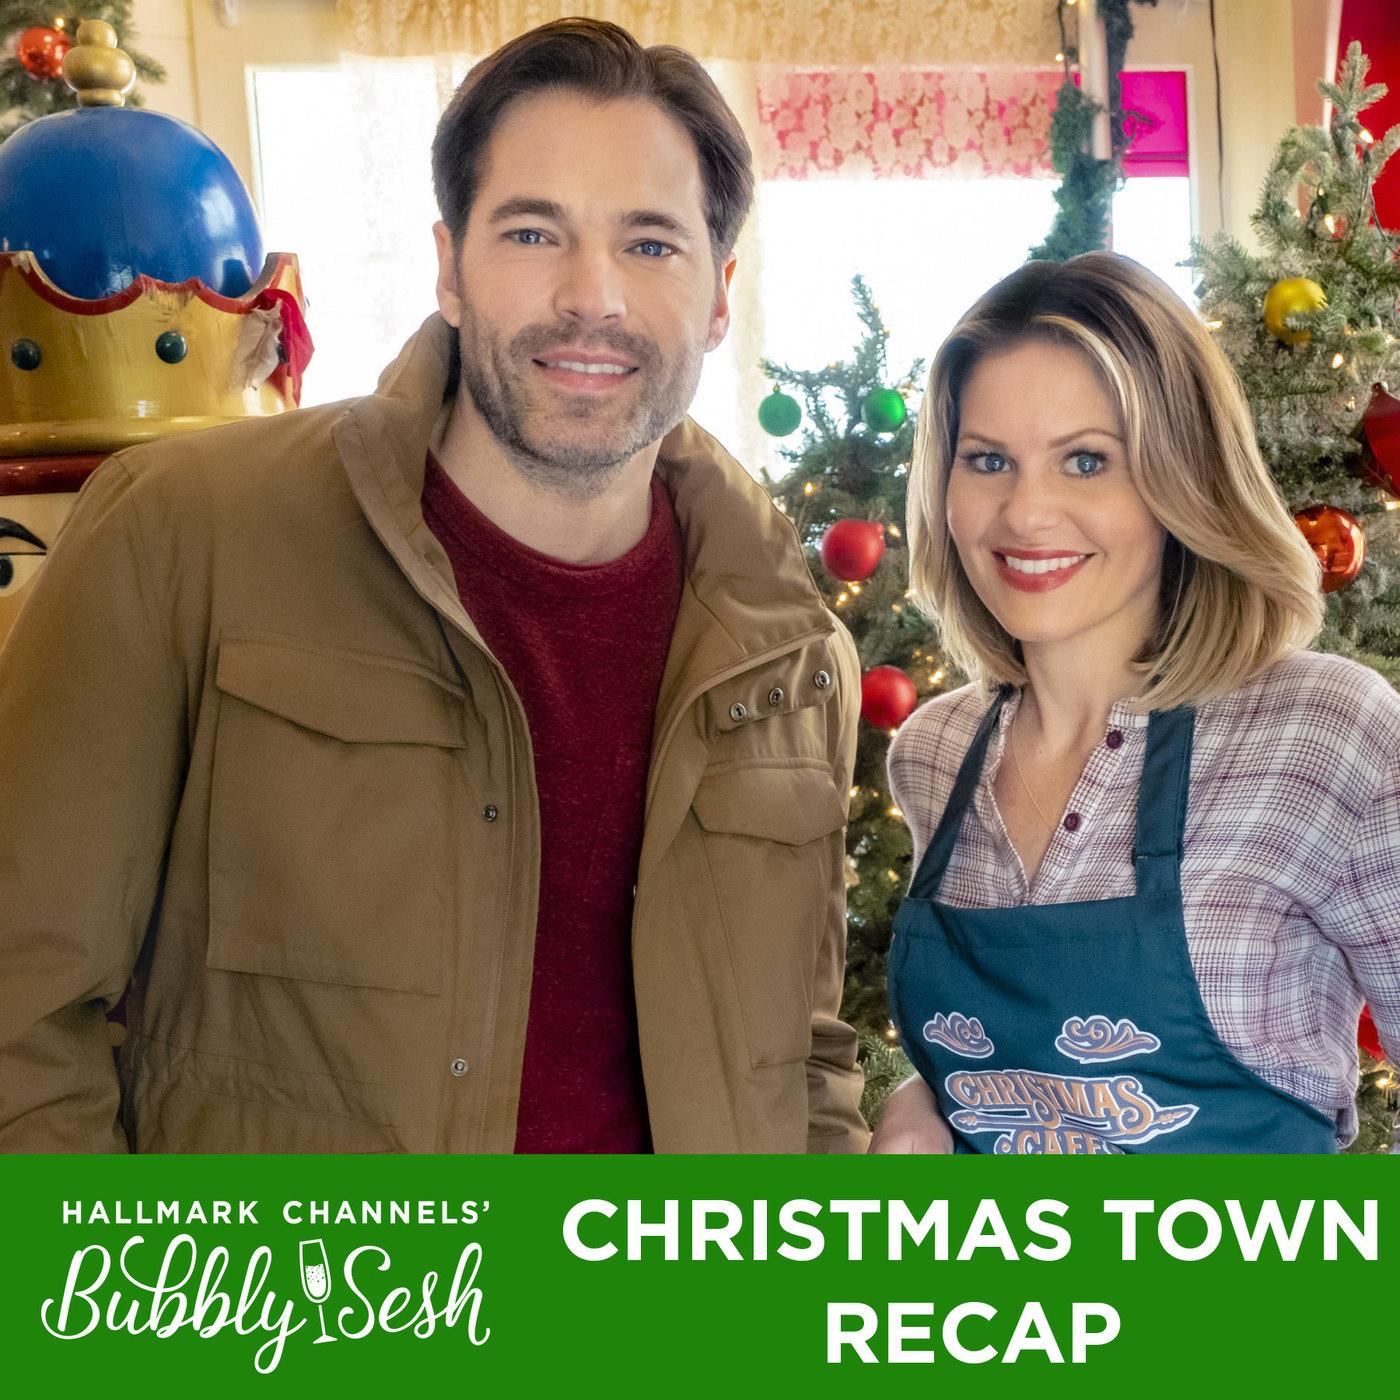 Christmas Town Recap